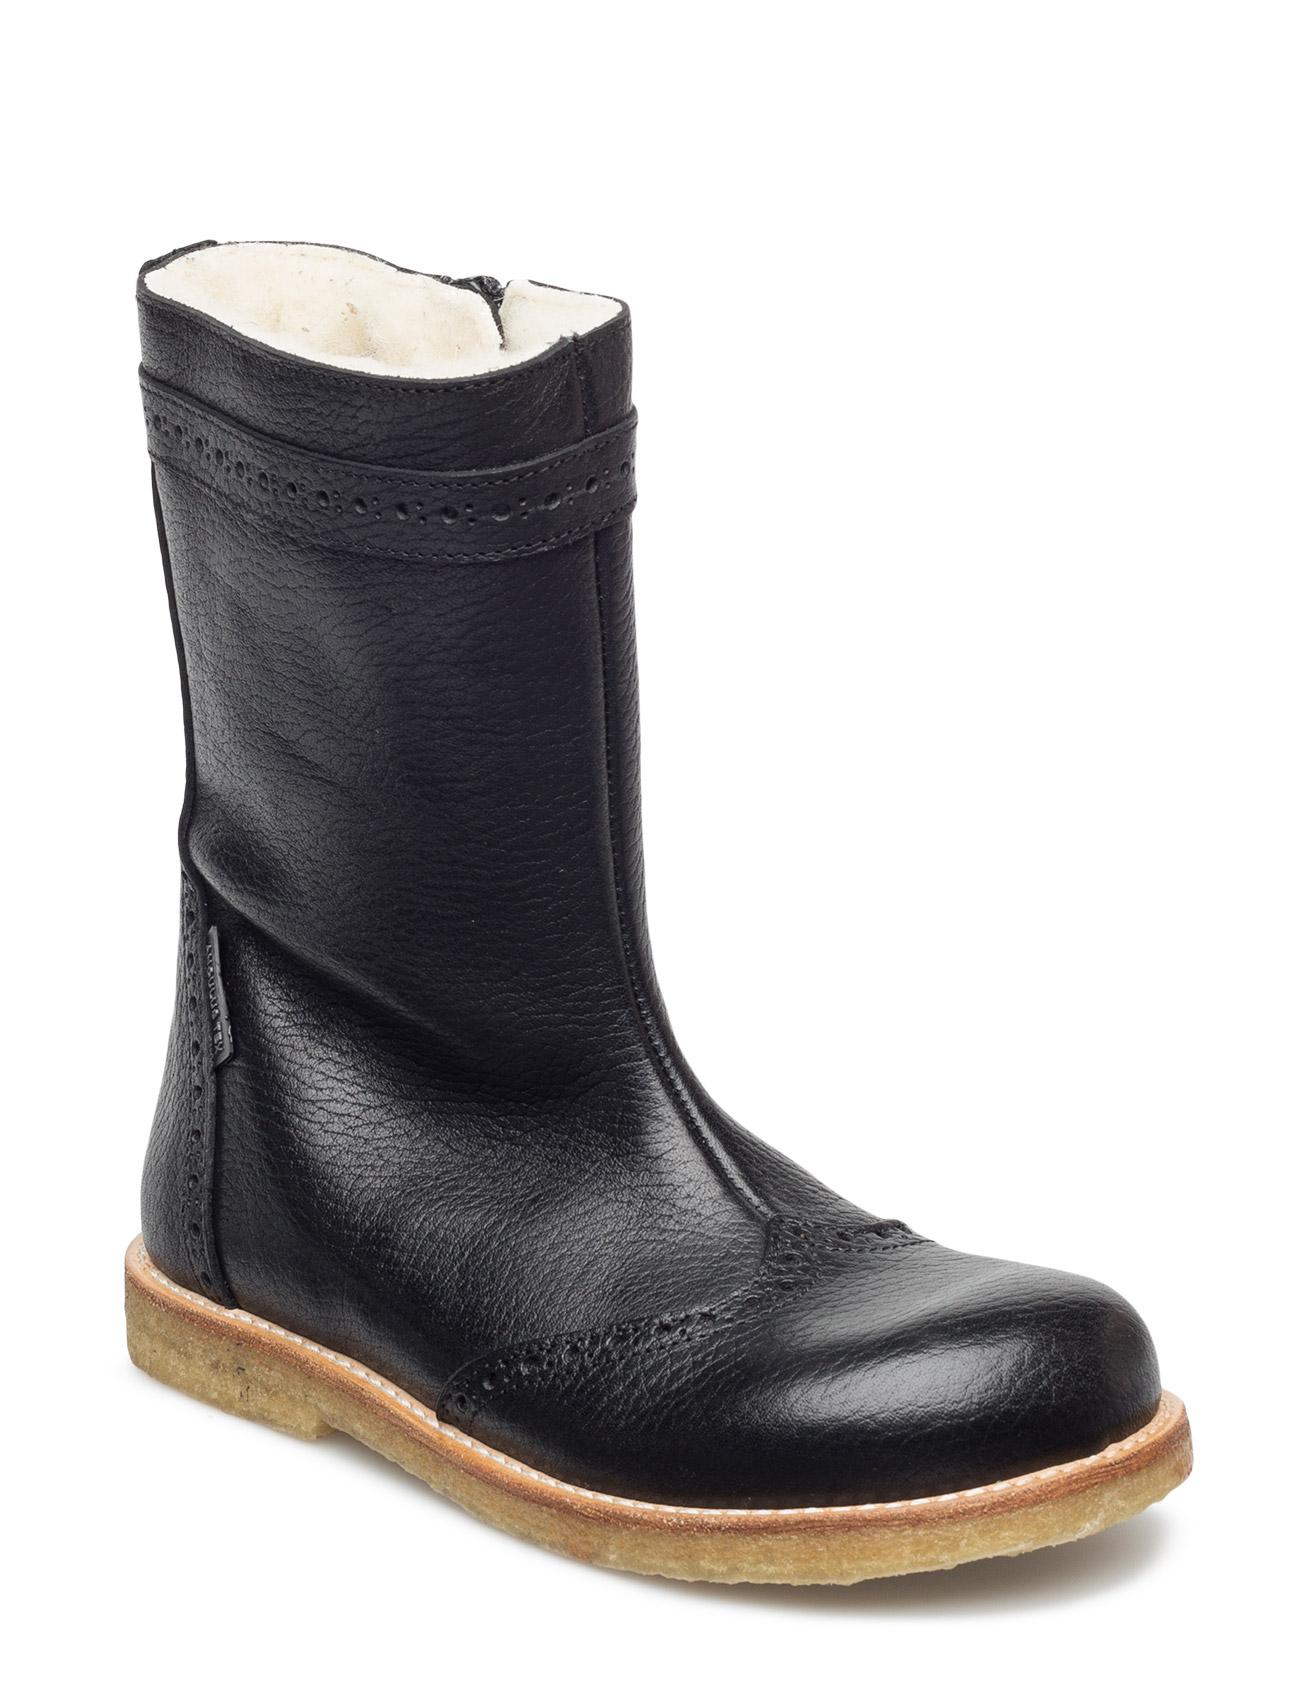 2369 ANGULUS Støvler til Børn i